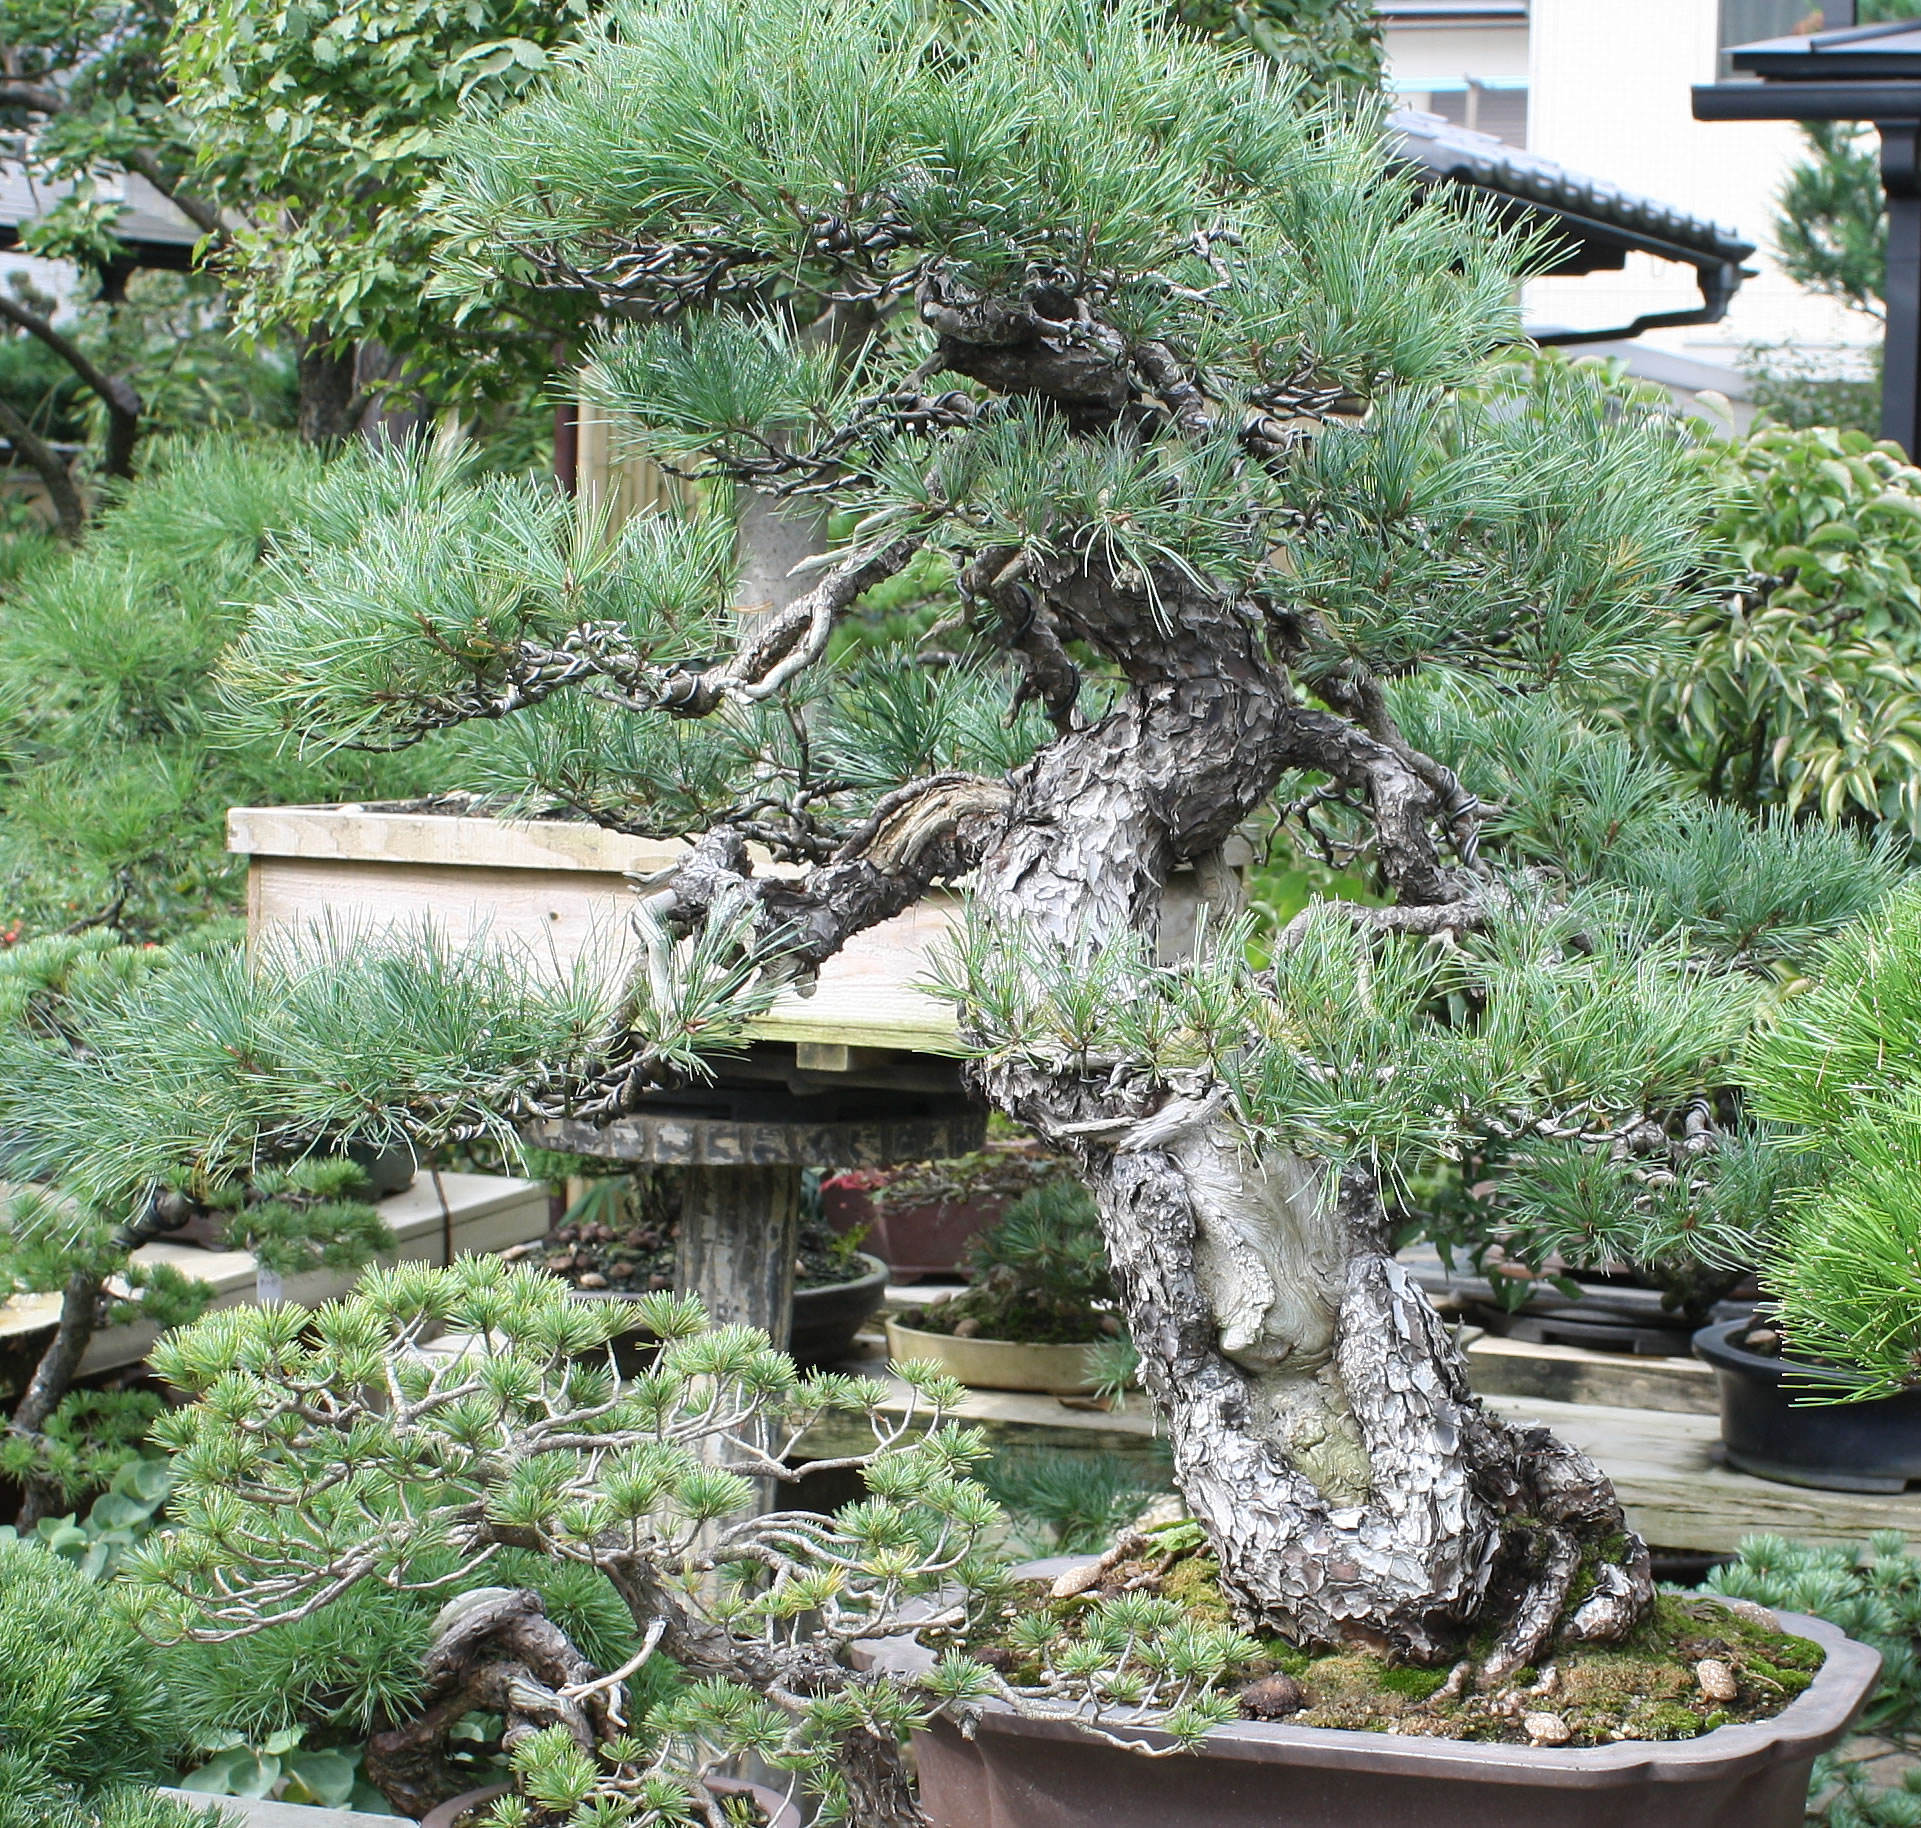 Tomio Yamada - zoom in on the old bark on this GoyoMatsu